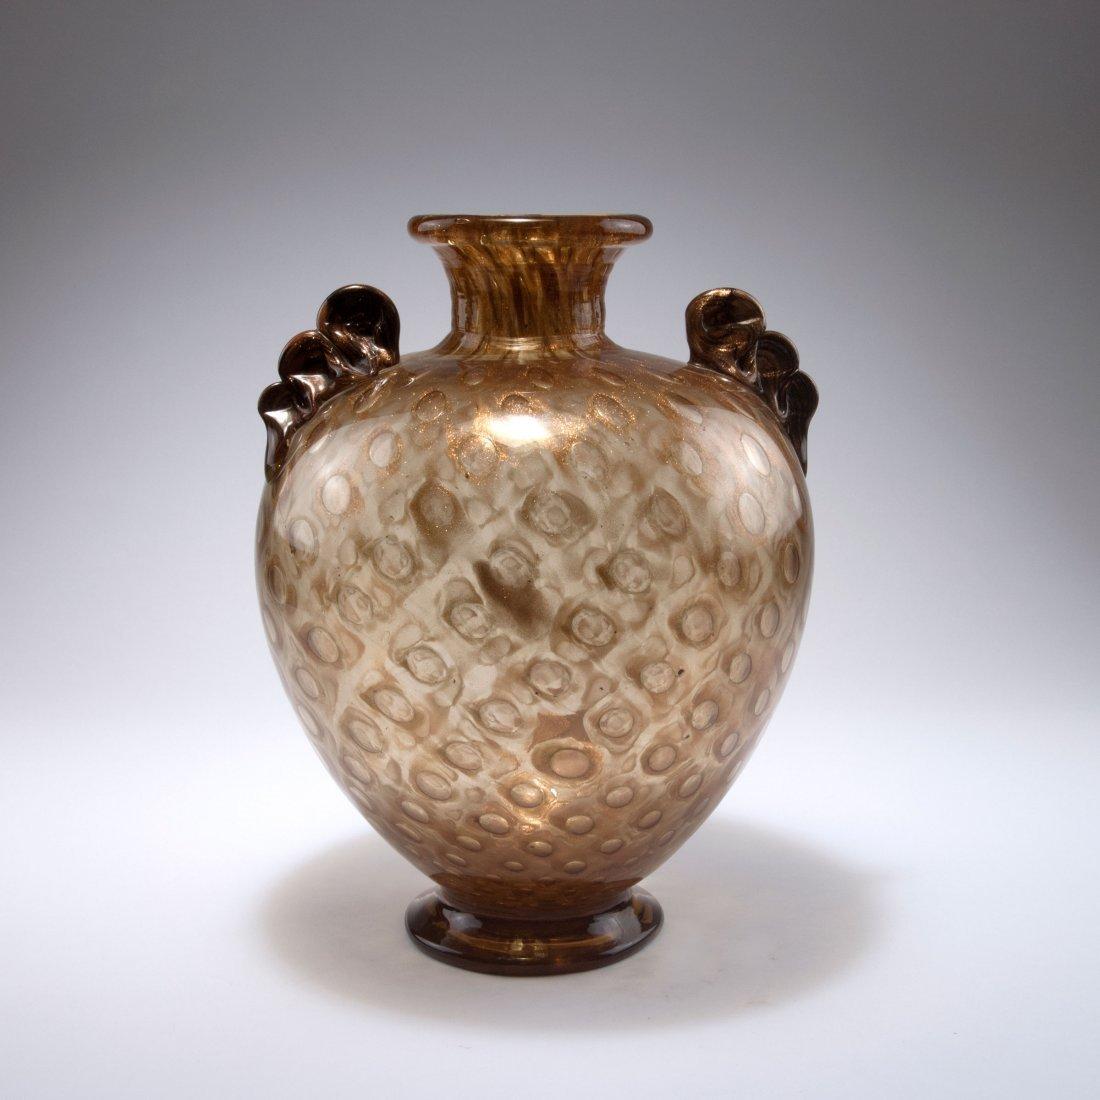 'Avventurina a bolle' vase with handles, c1936 - 3